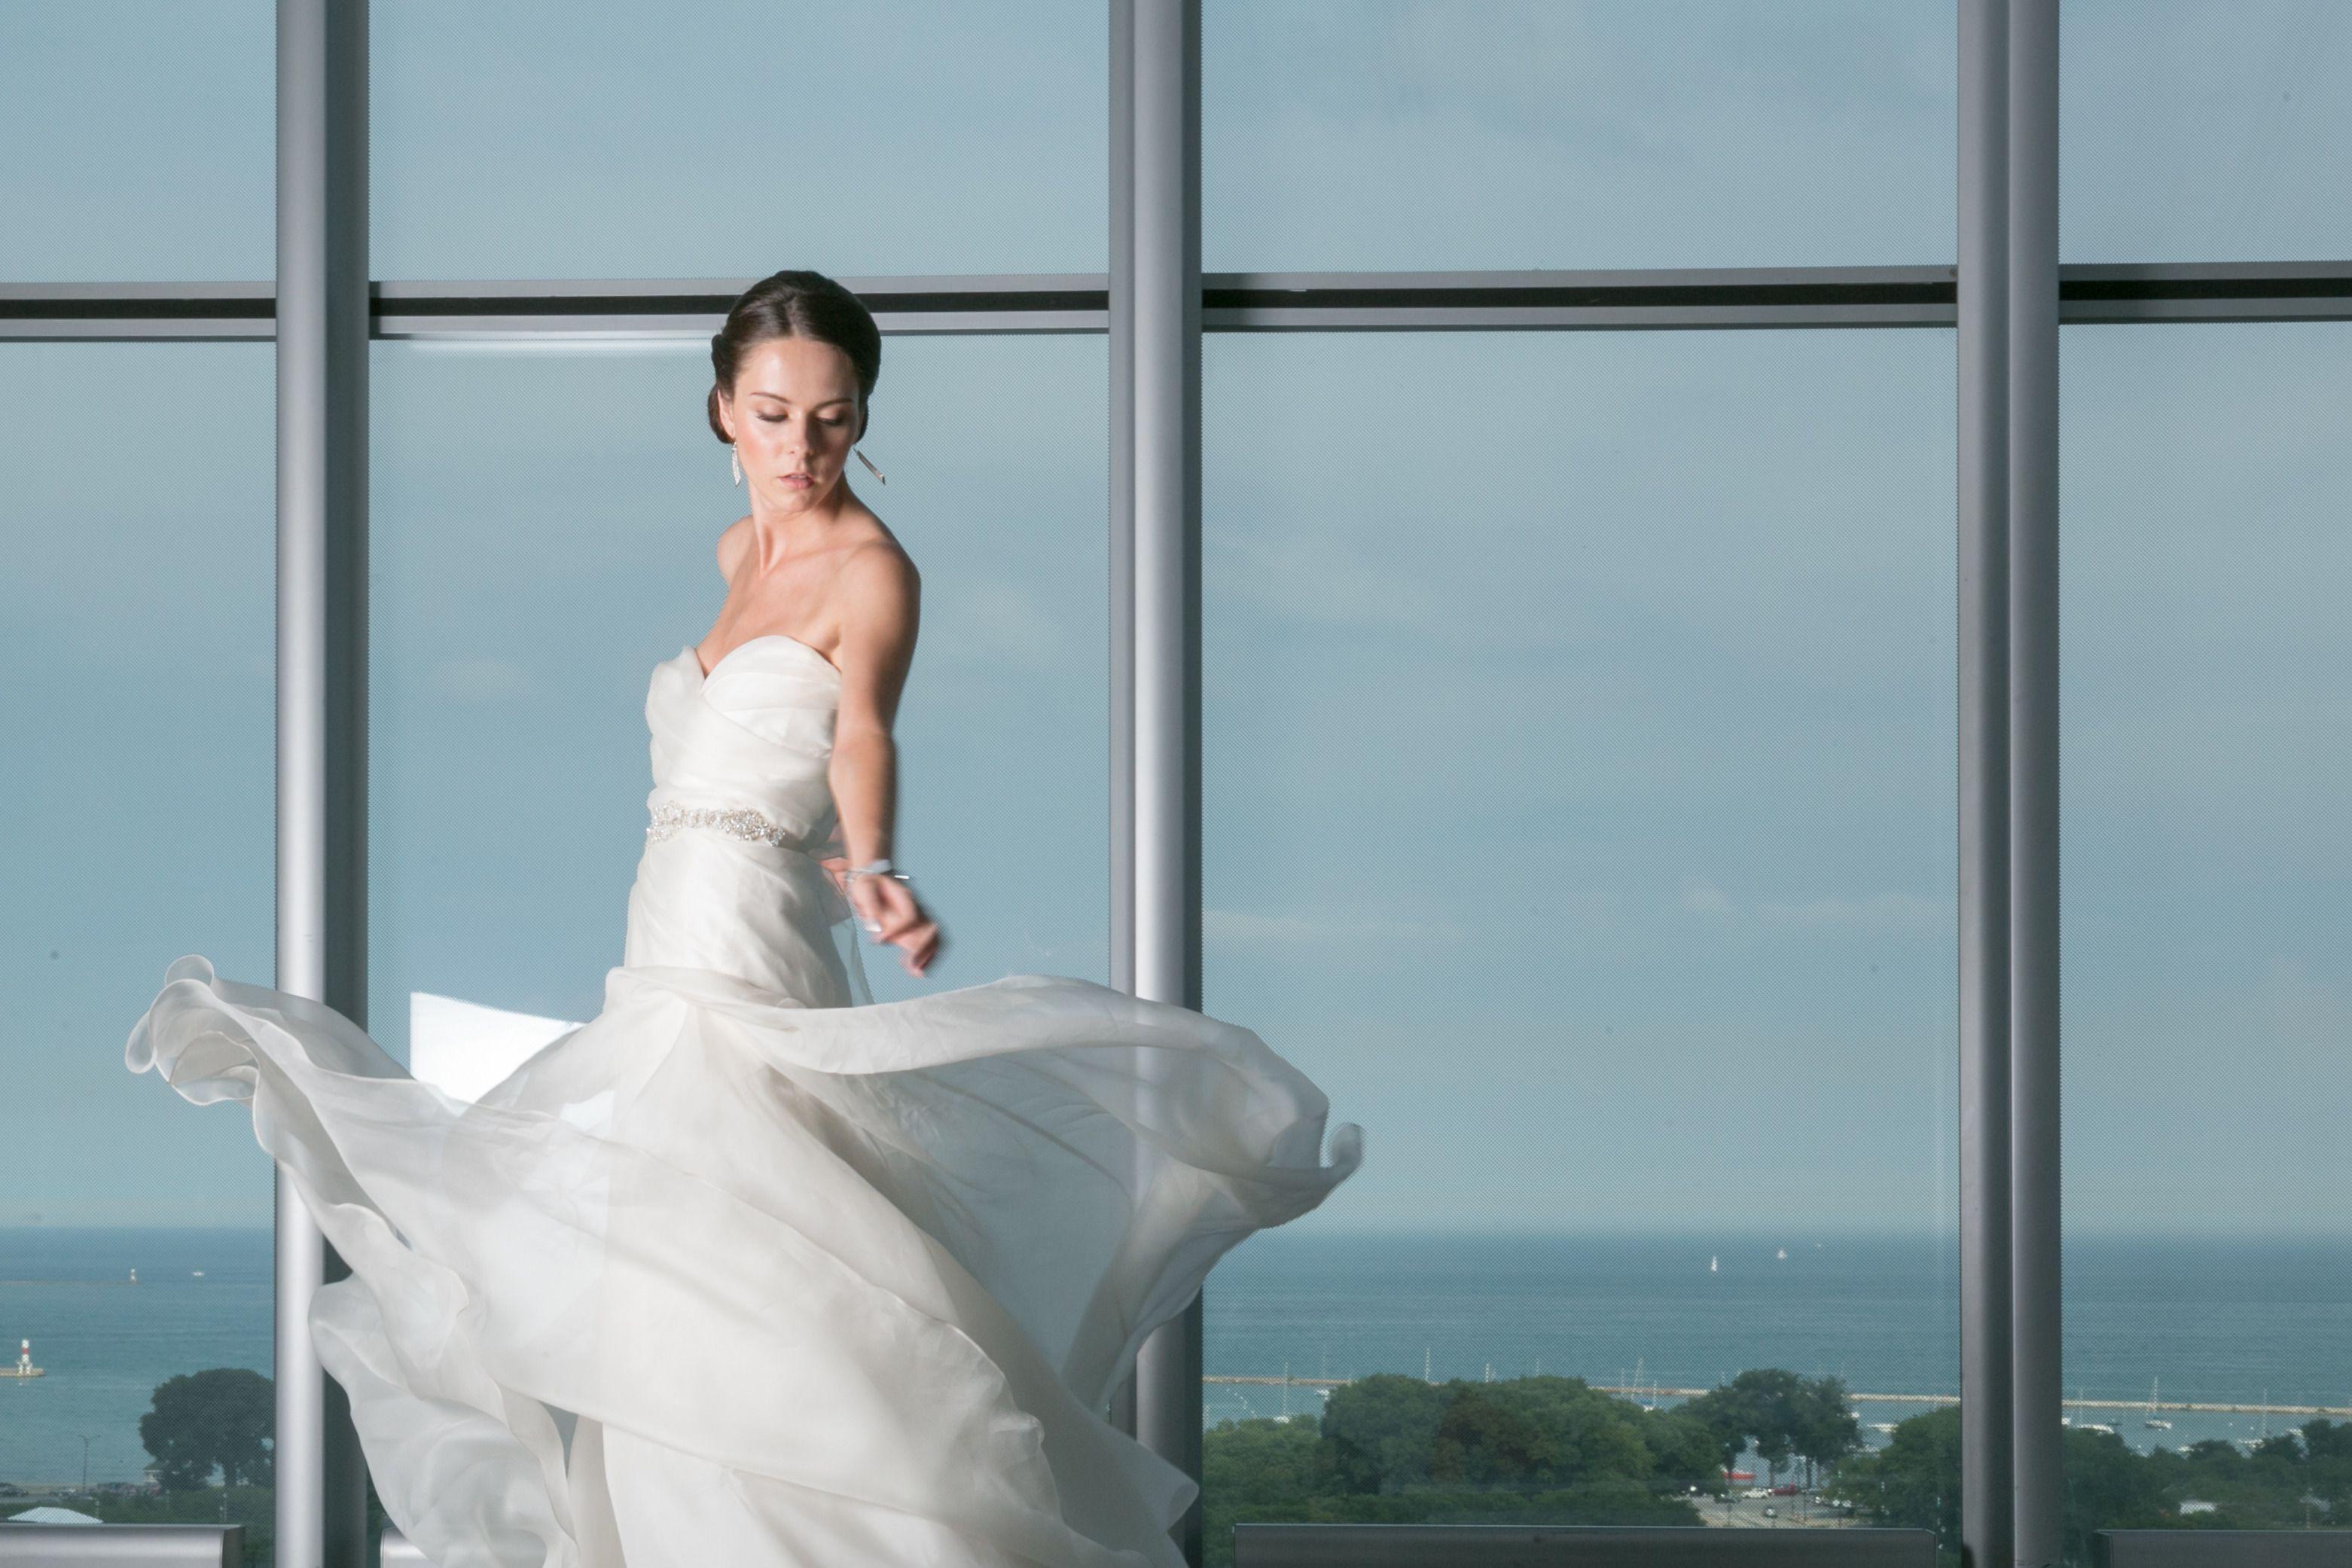 Design: Citygirl Weddings & Events http://www.citygirlweddings.com/ Photography: Ann & Kam Photography & Cinema - www.annkam.com  Read More: http://www.stylemepretty.com/2013/09/23/modern-wedding-inspiration-from-ann-kam-photography-citygirl-weddings/